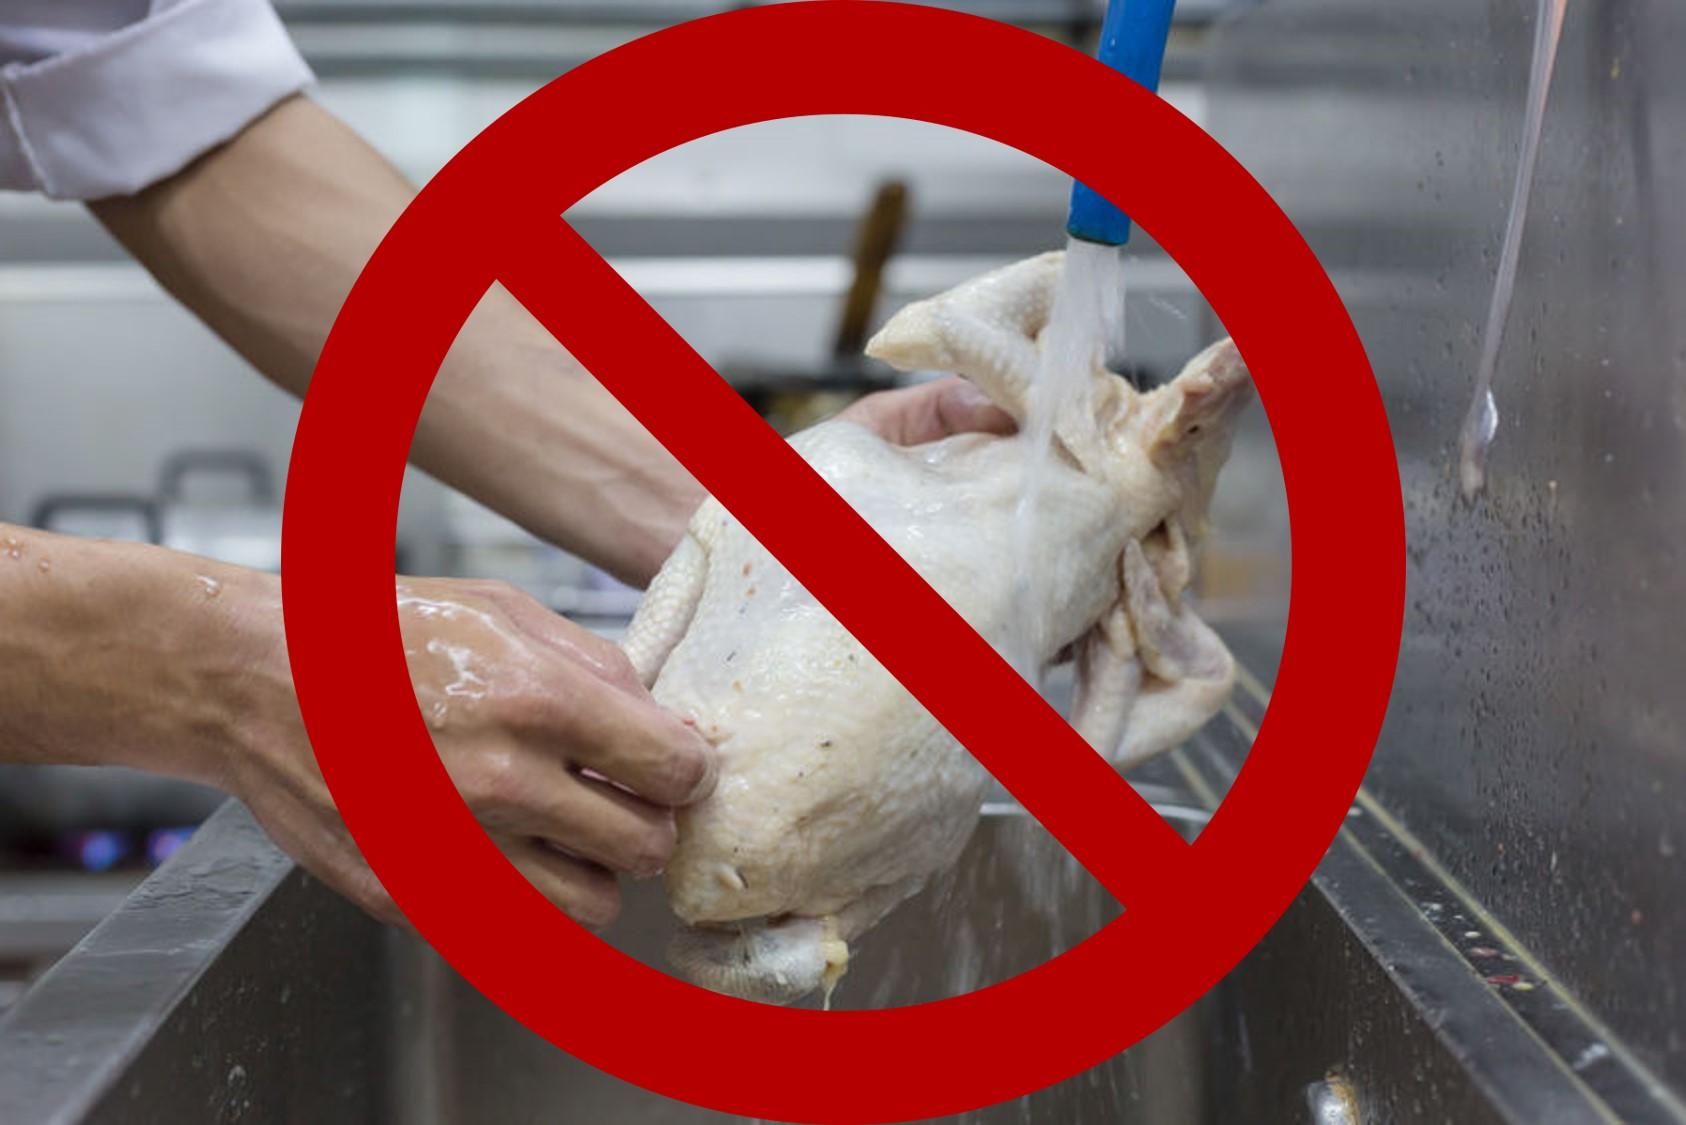 ServSafe food training for raw chicken